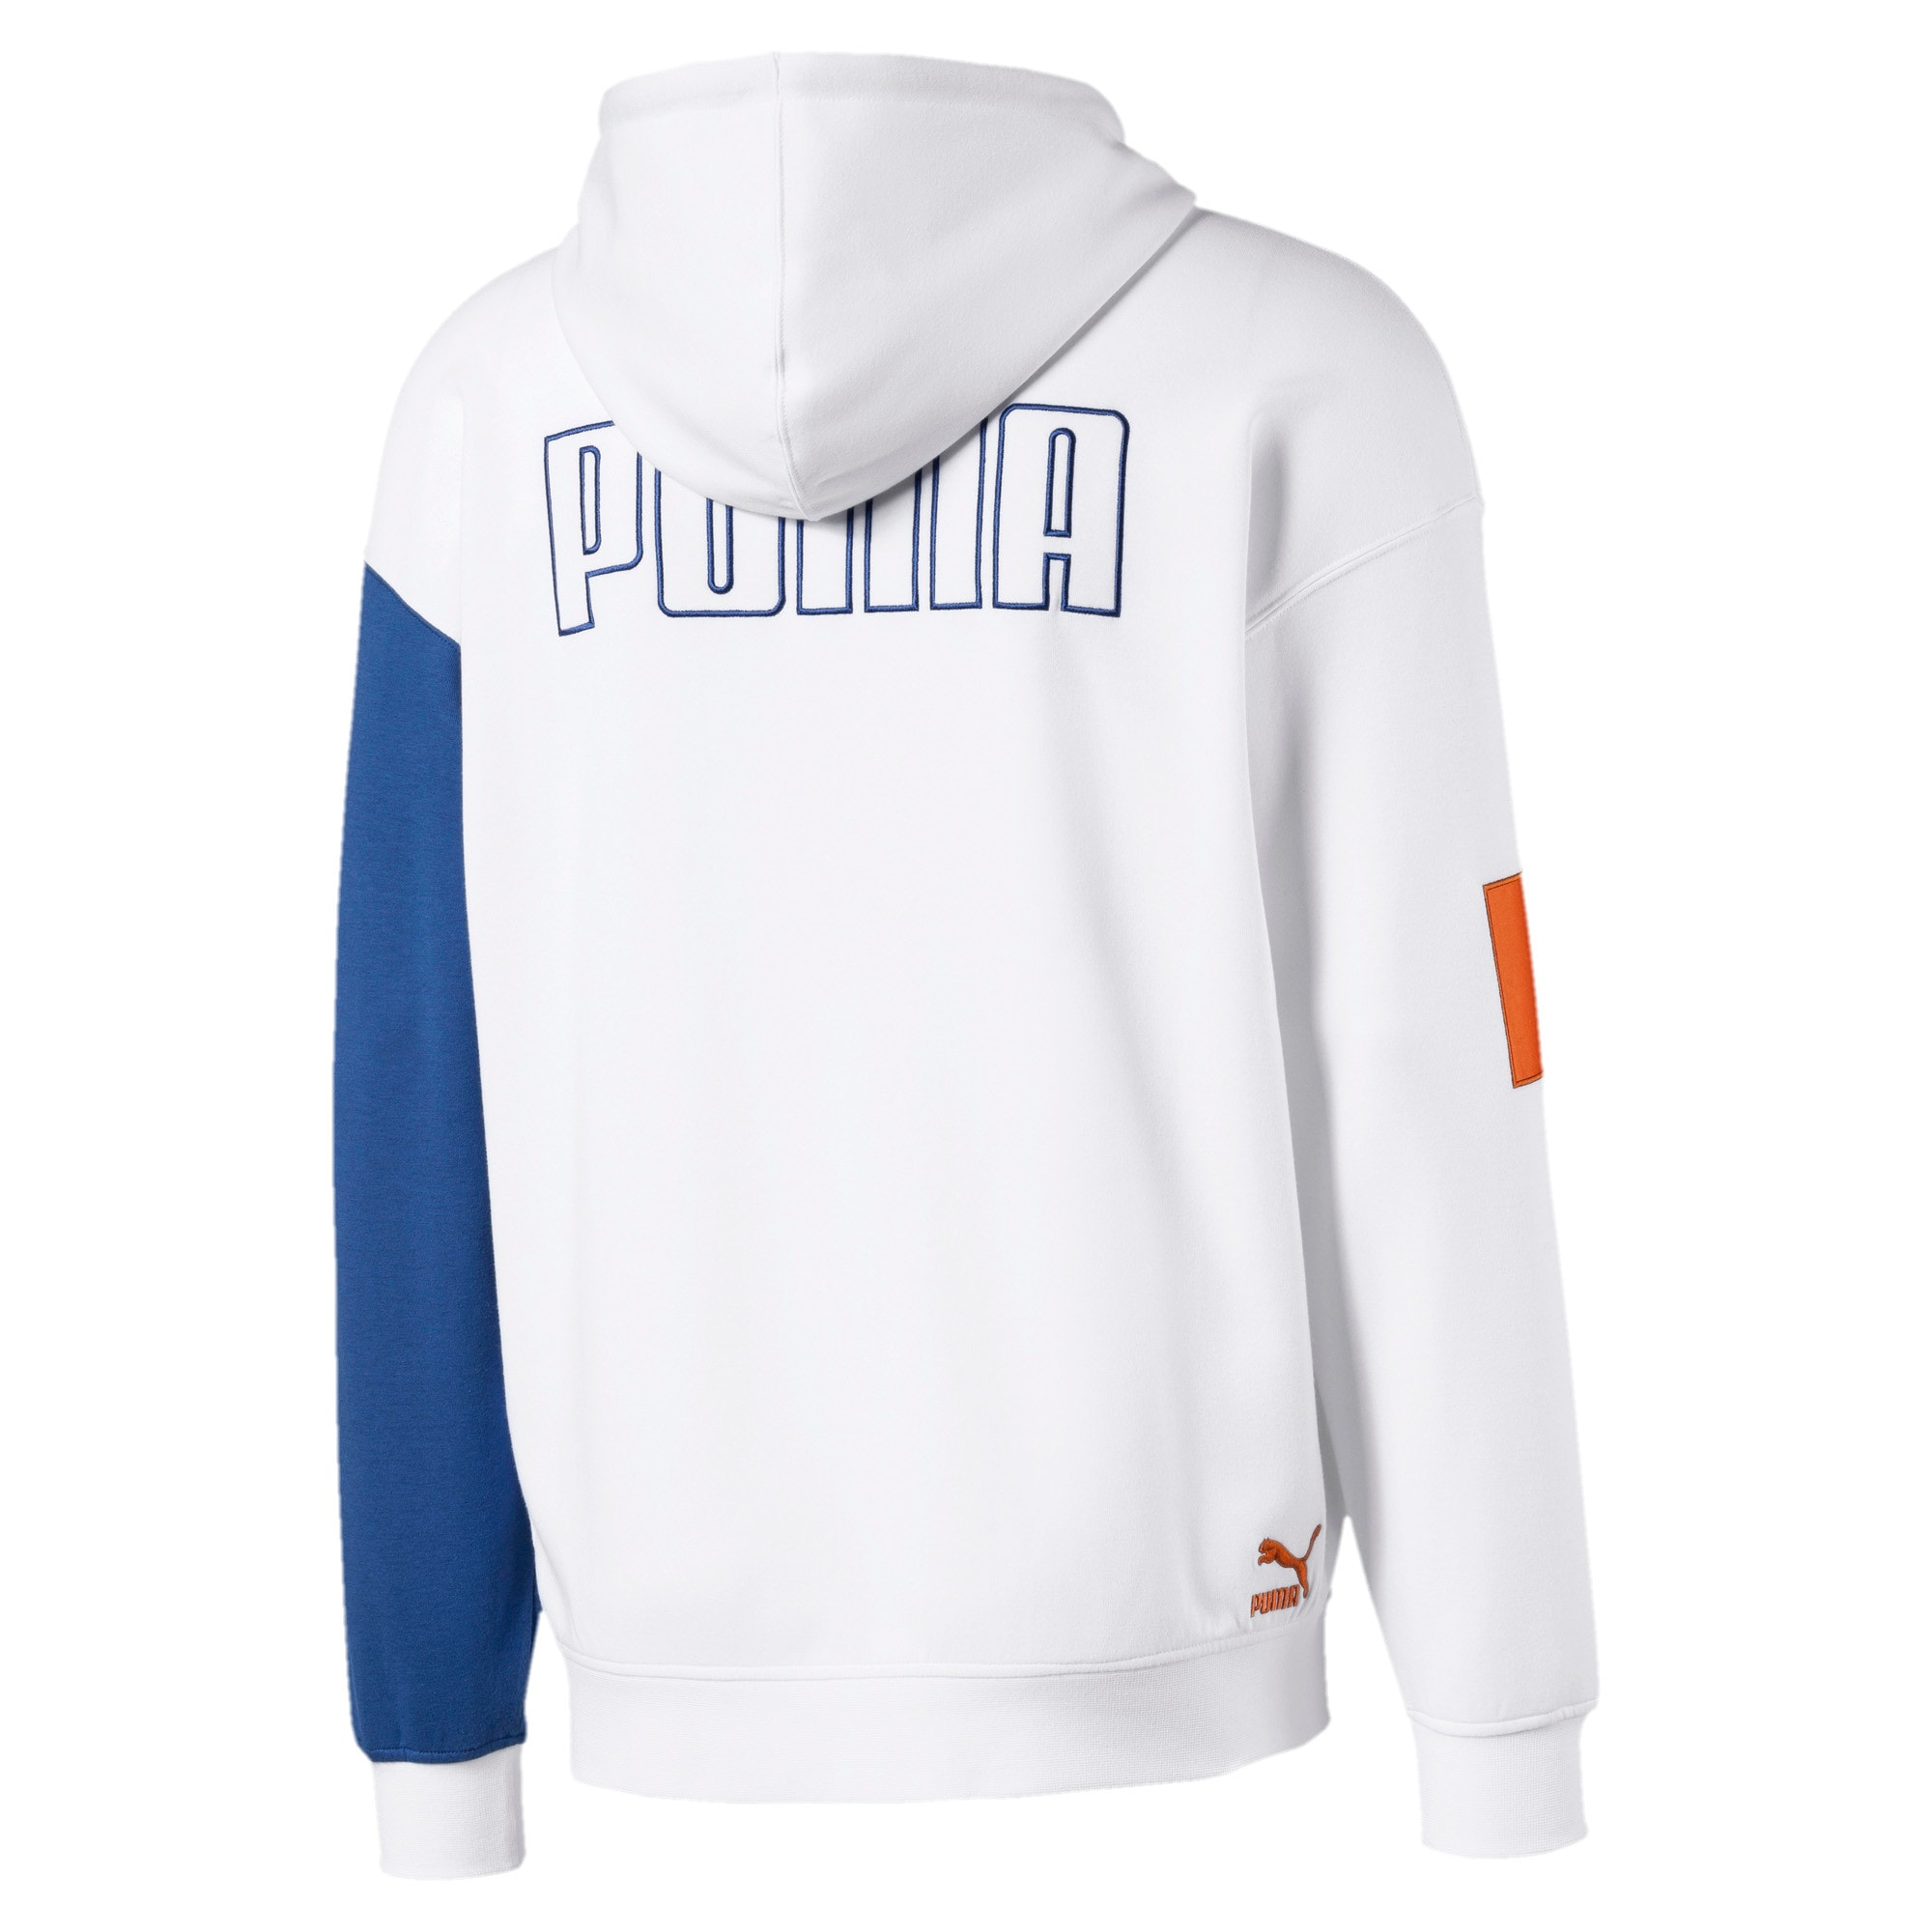 Thumbnail 2 of Colour Block Hooded Men's Sweat Jacket, Puma White, medium